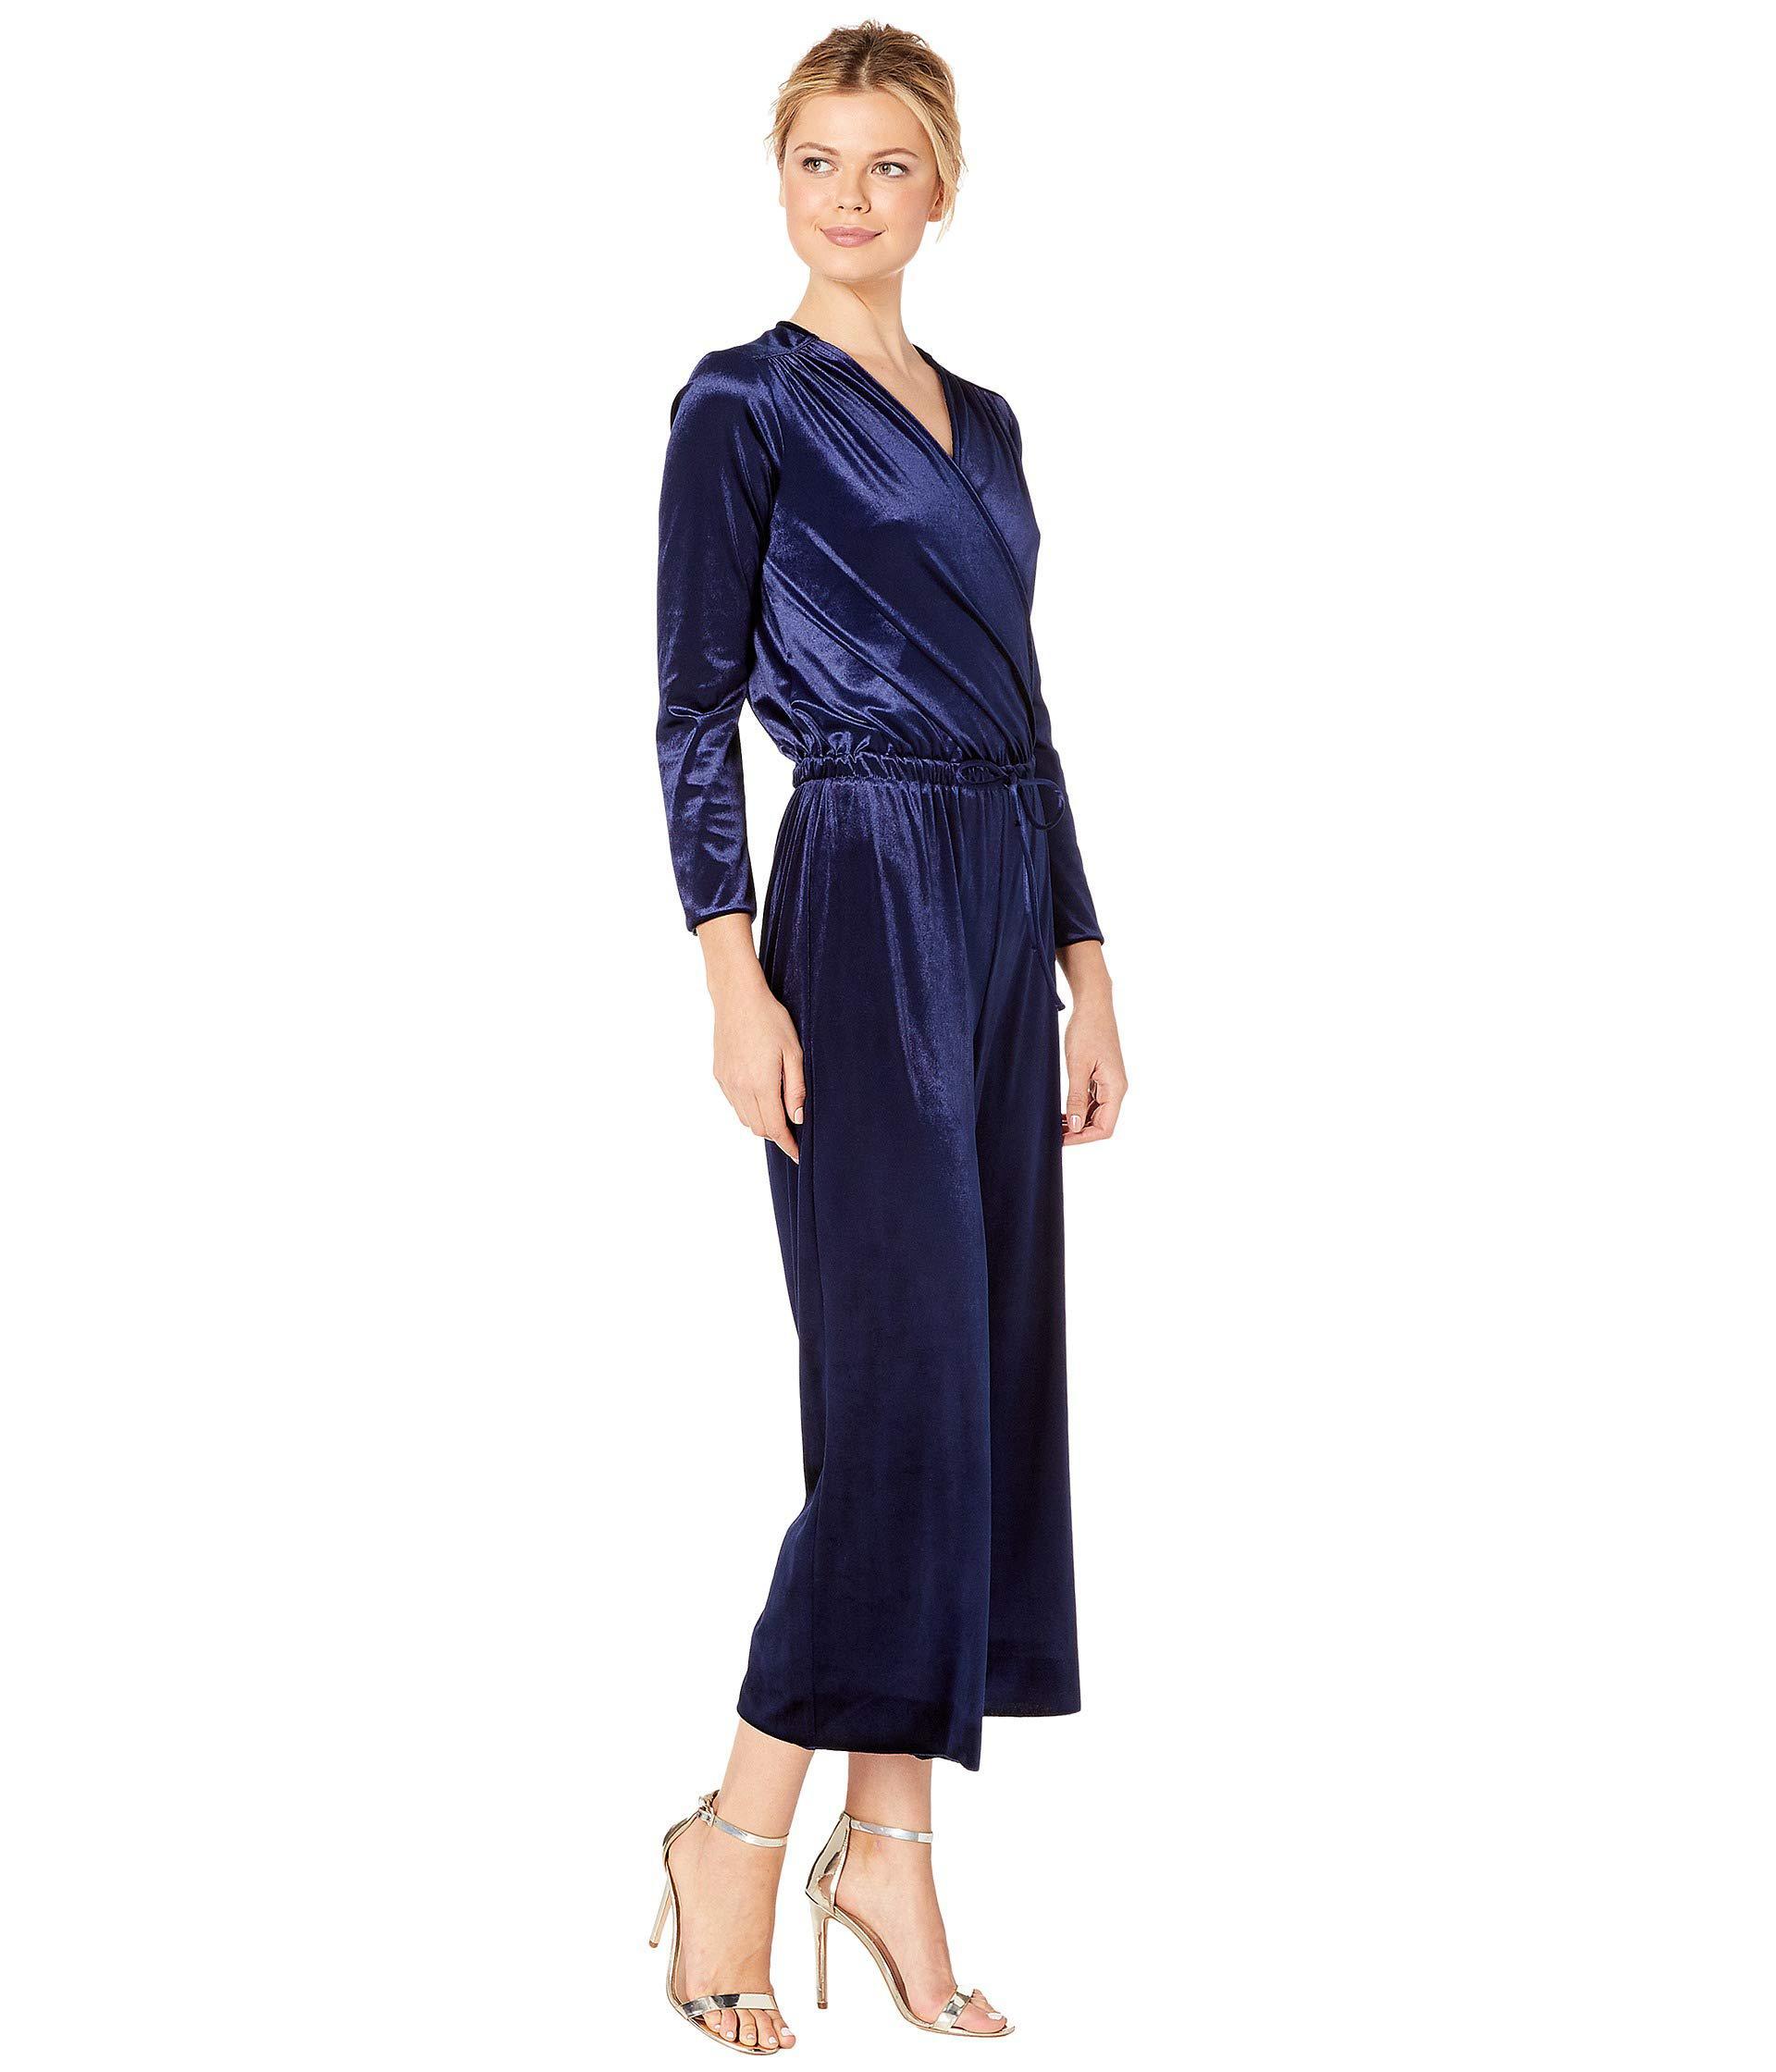 b808f45f32a9 Three Dots - Blue Stretch Panne Velvet Jumpsuit (navy) Women s Jumpsuit   Rompers  One. View fullscreen